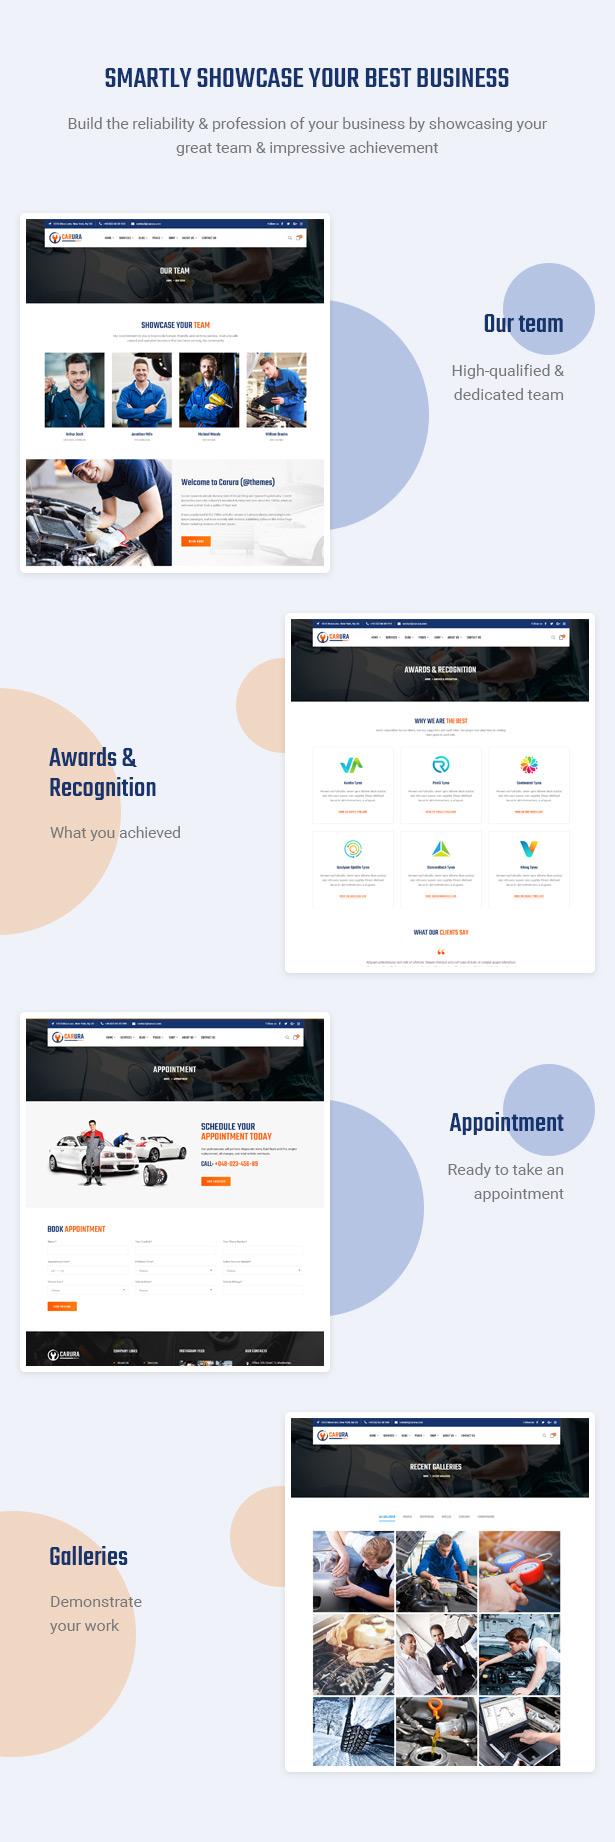 Build Up Business Reputation Effectively - Carsao - Car Service & Auto Mechanic WordPress Theme